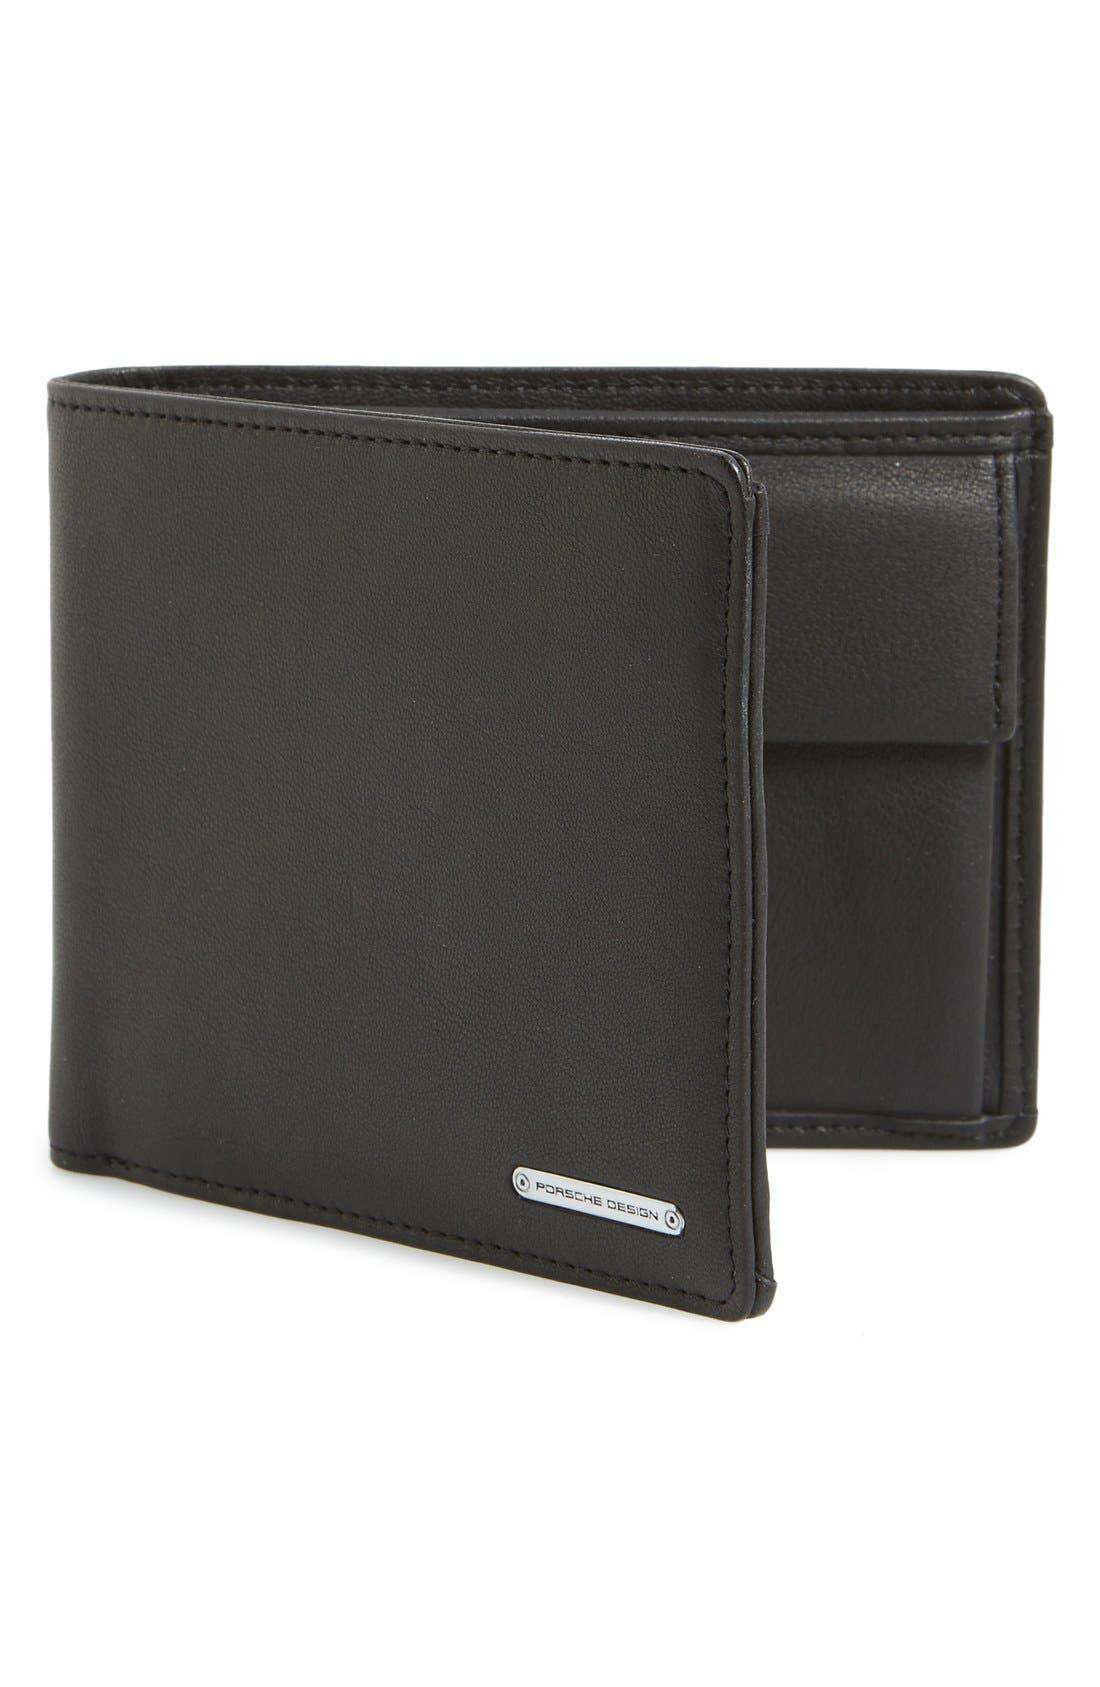 Main Image - Porsche Design 'CL2 2.0' Leather Billfold Wallet